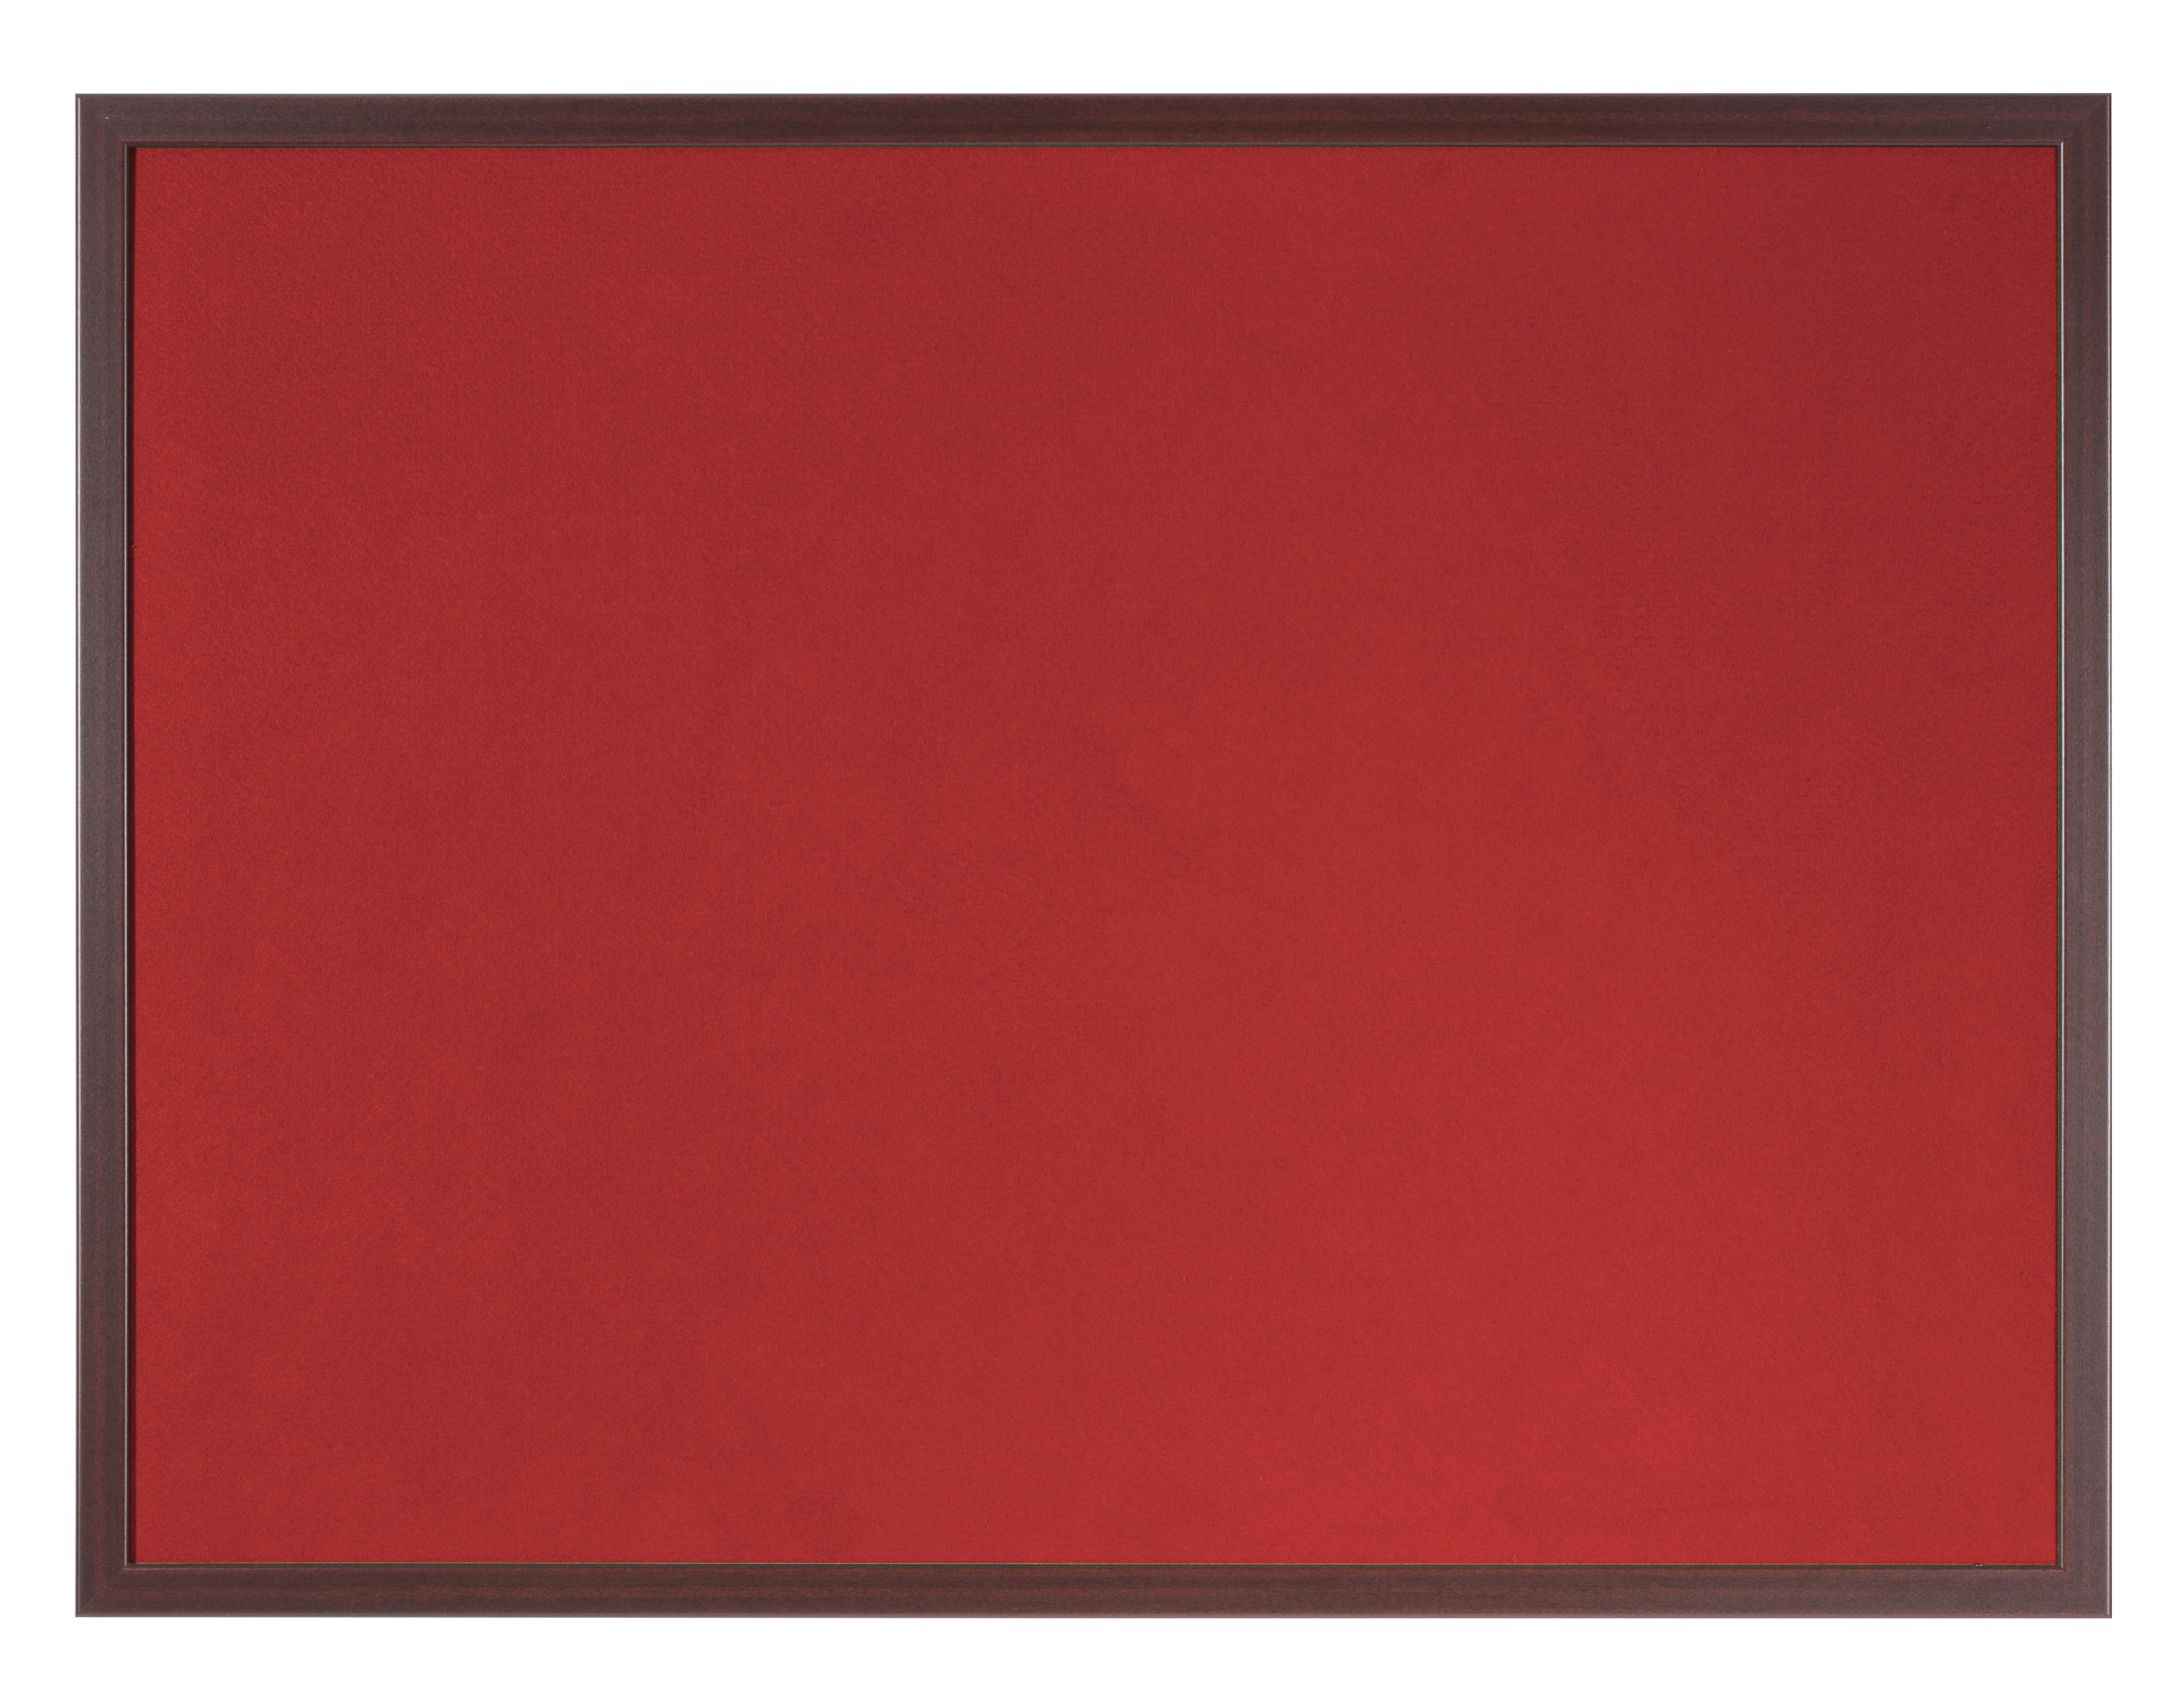 Felt Bi-Office Earth-It Red Felt Noticeboard Cherry Wood Frame 600x900mm